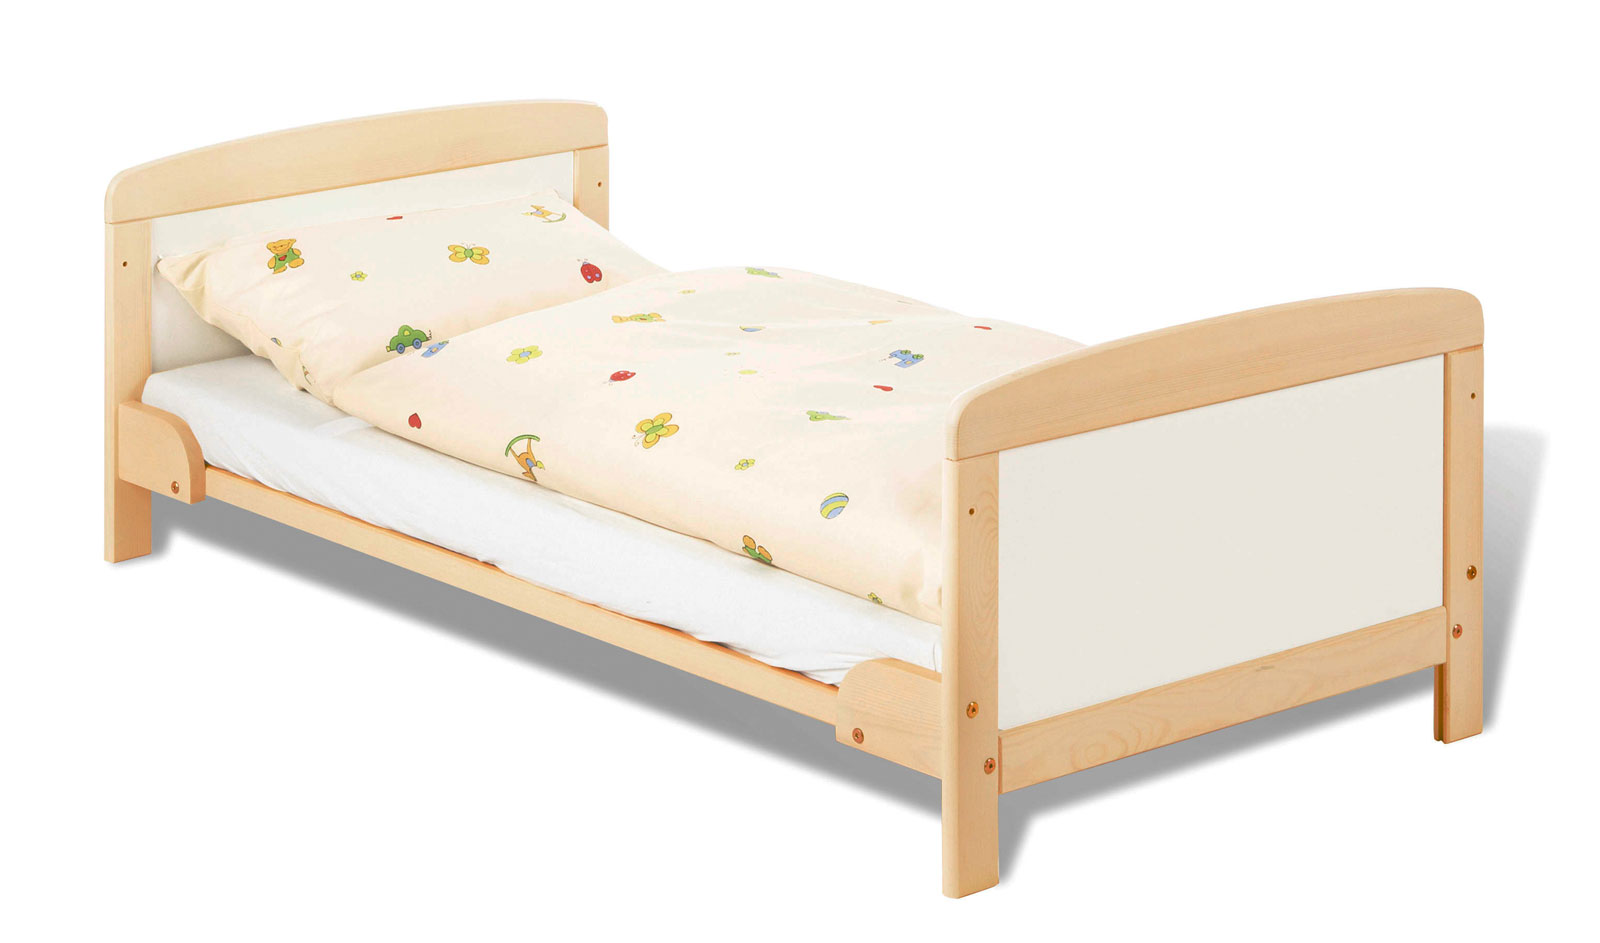 kinderbett aus buche umbaubar zum juniorbett florian. Black Bedroom Furniture Sets. Home Design Ideas